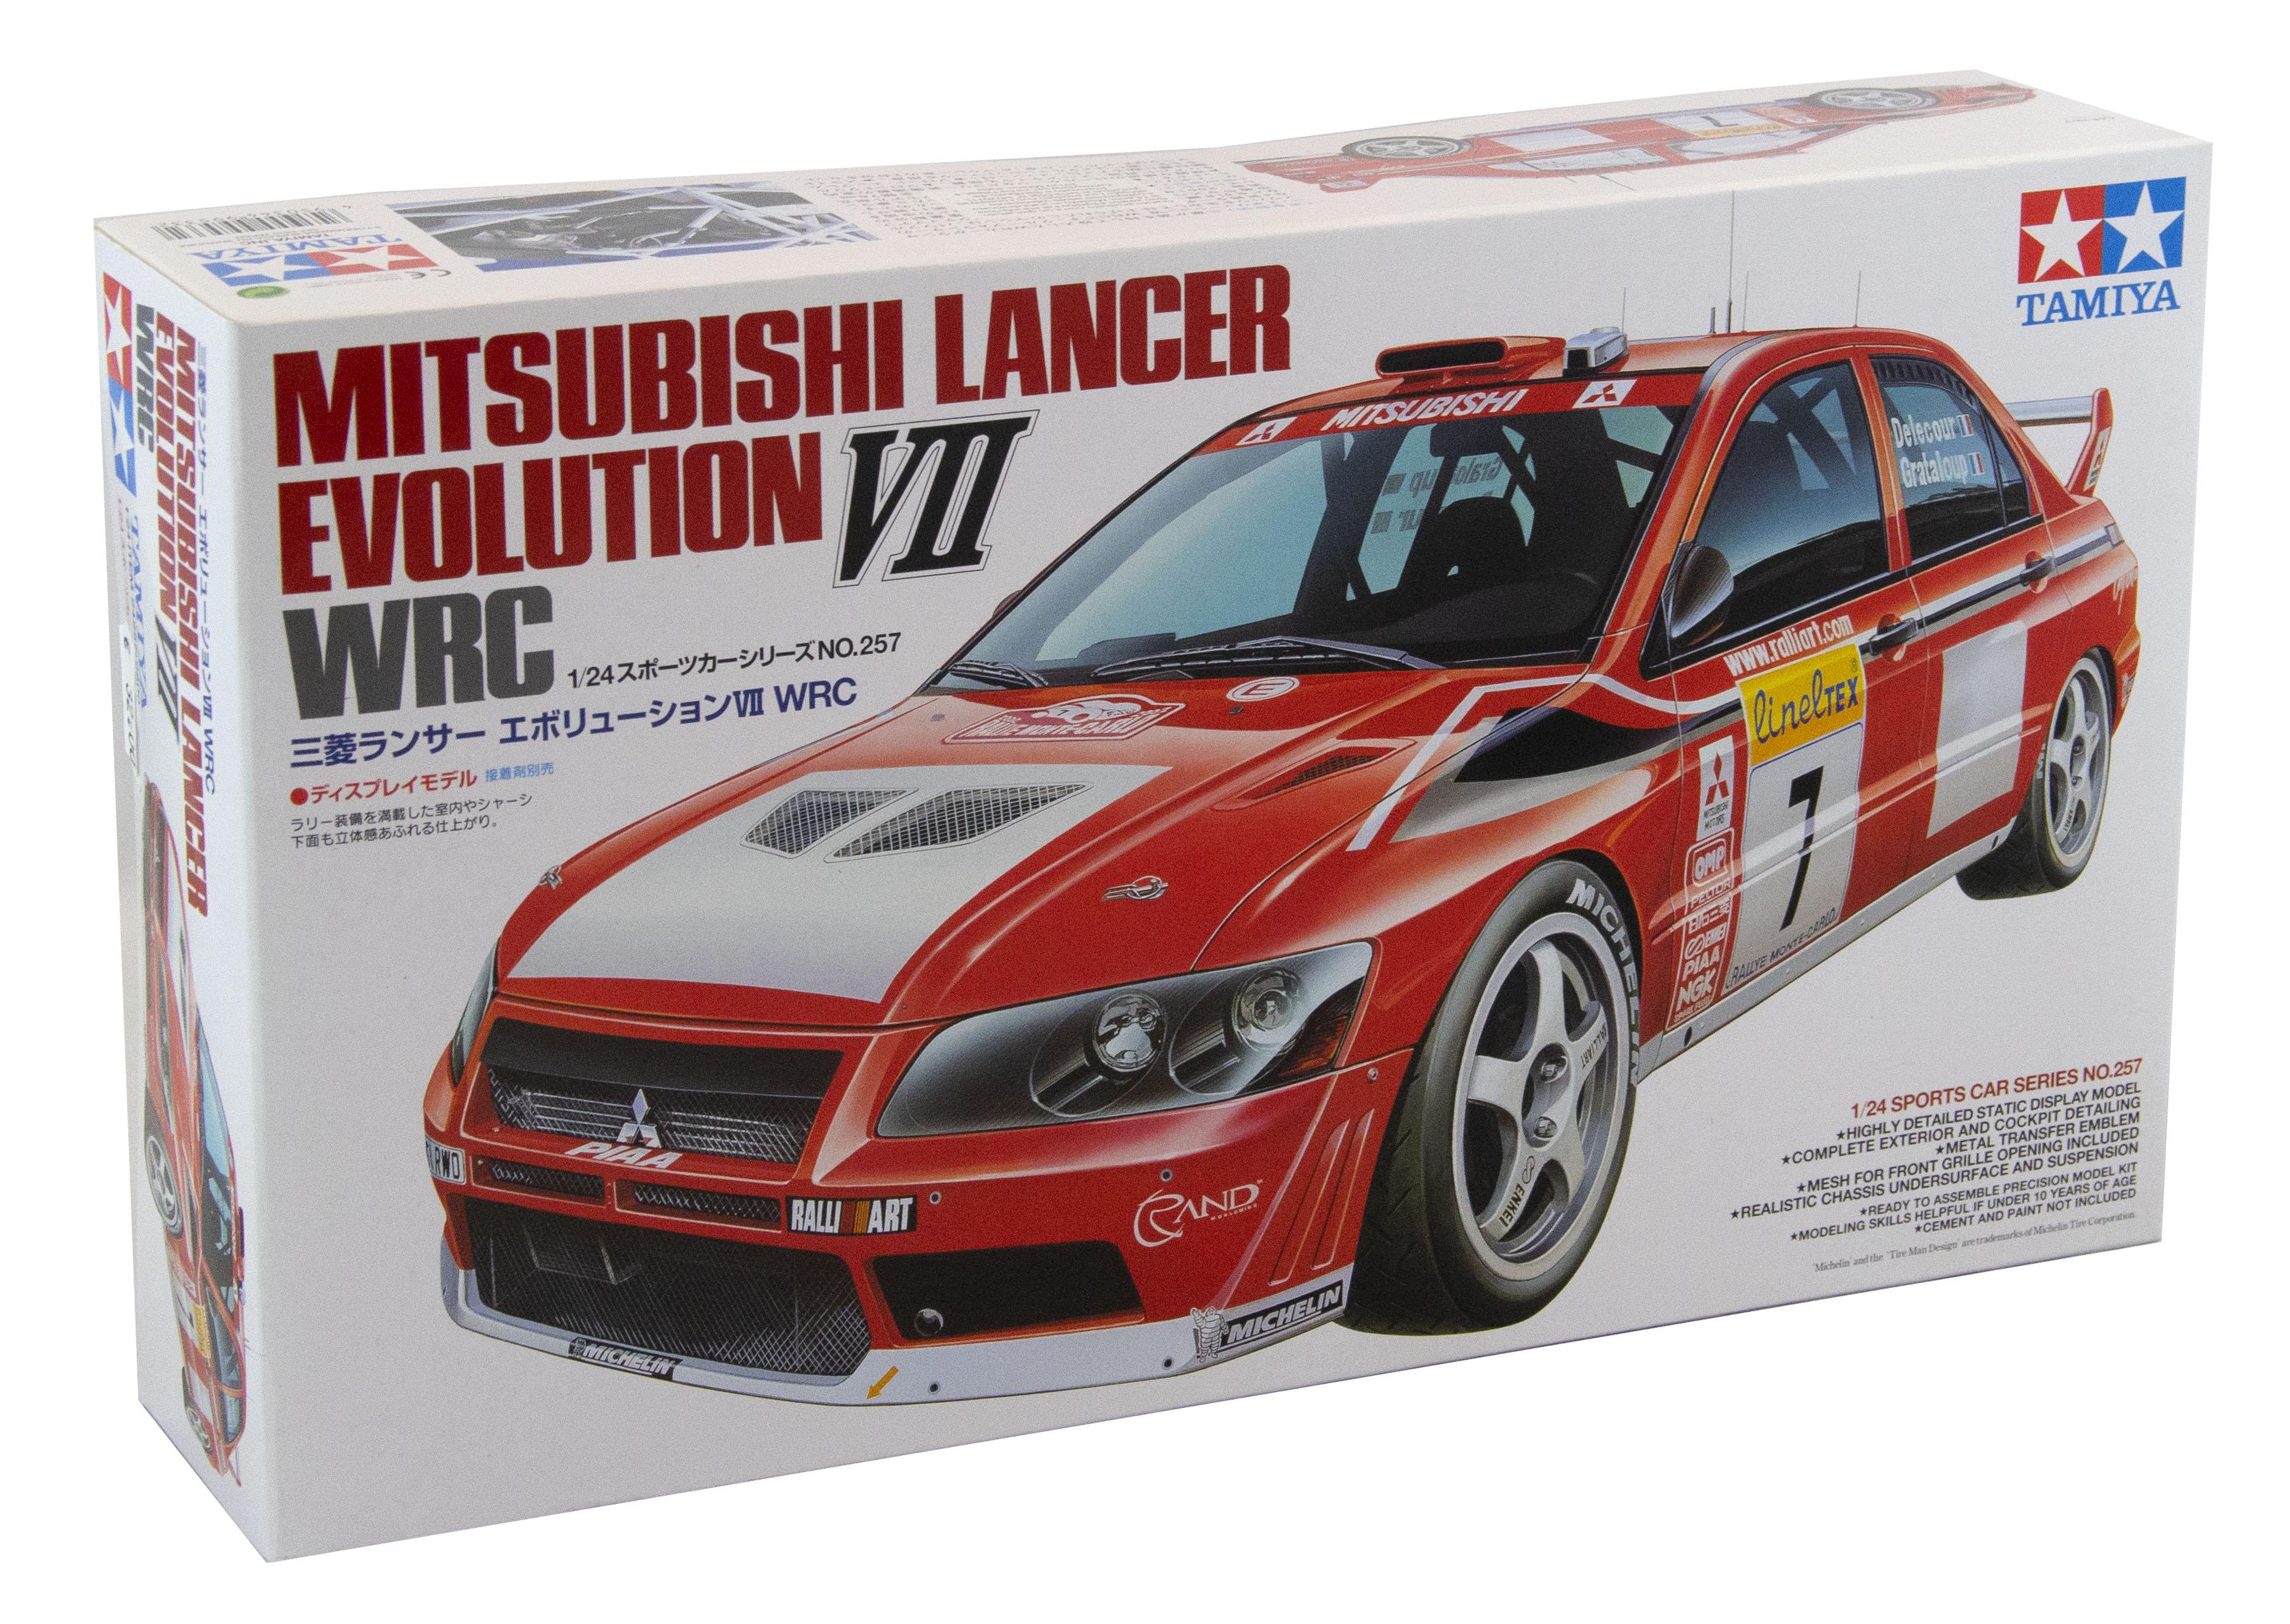 Kit Mitsubishi Lancer Evolution VII Wrc 1/24